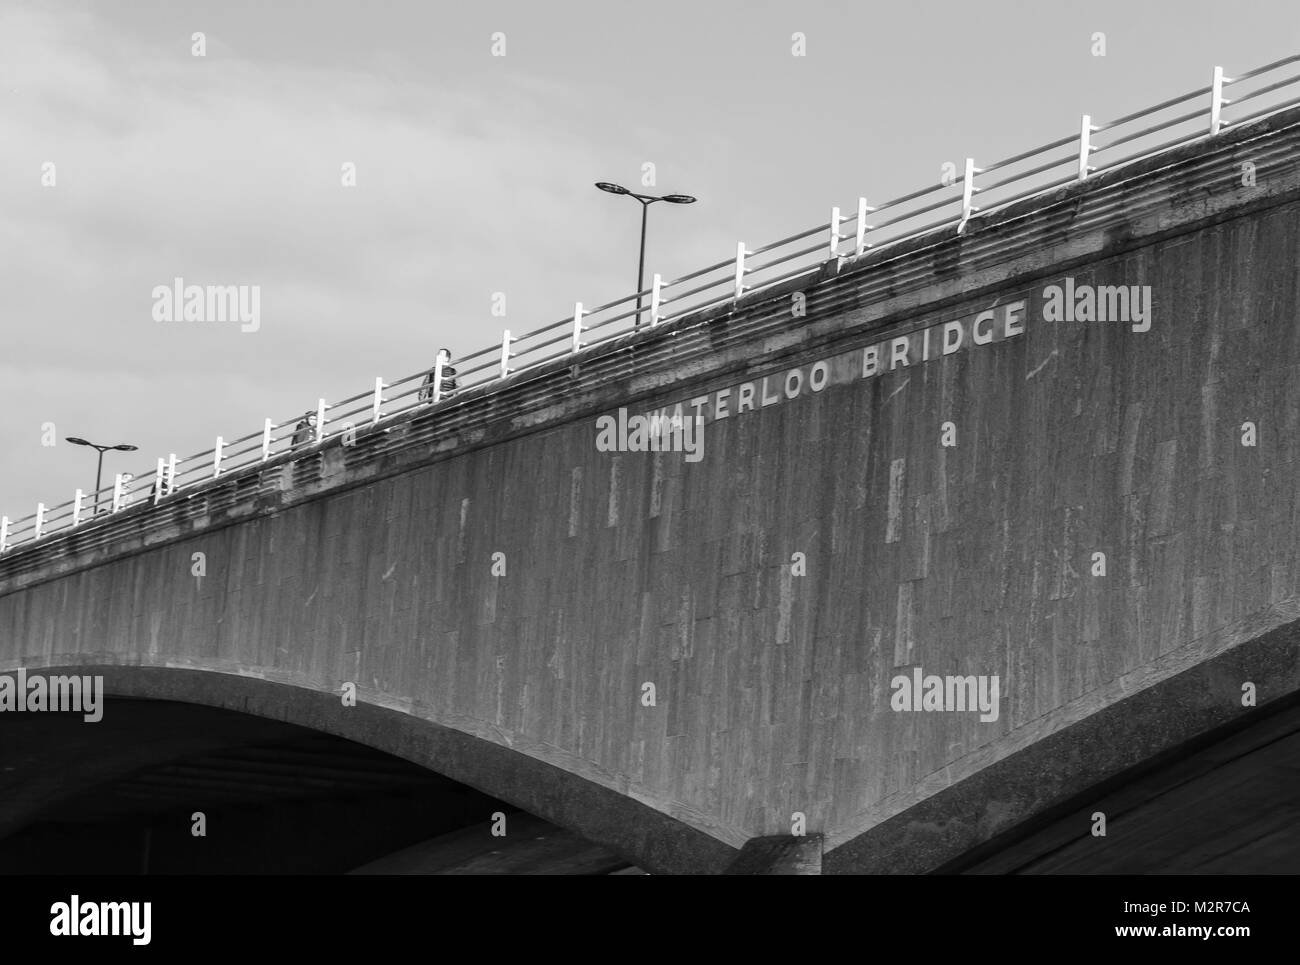 Waterloo Bridge - inscription on the famous bridge s/w - Stock Image